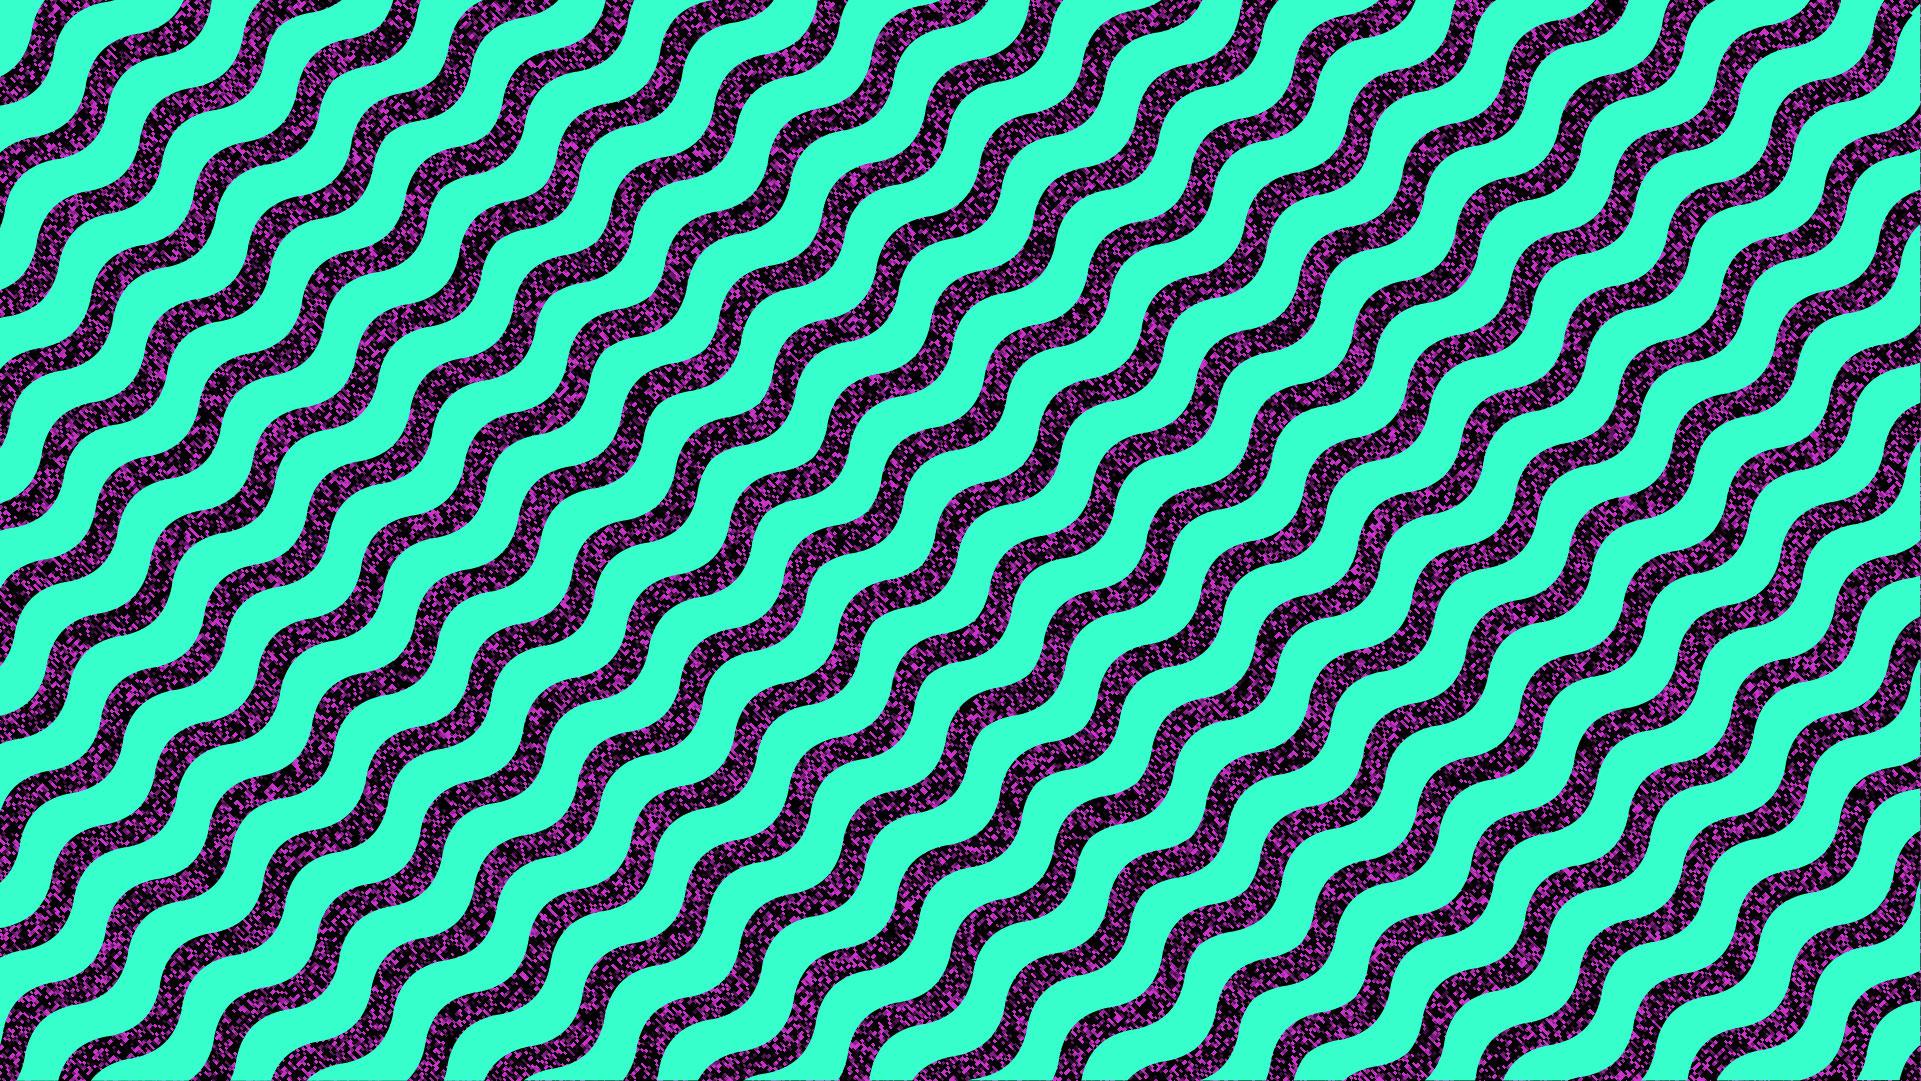 Go Back Images For 90s Wallpaper Patterns 1921x1081